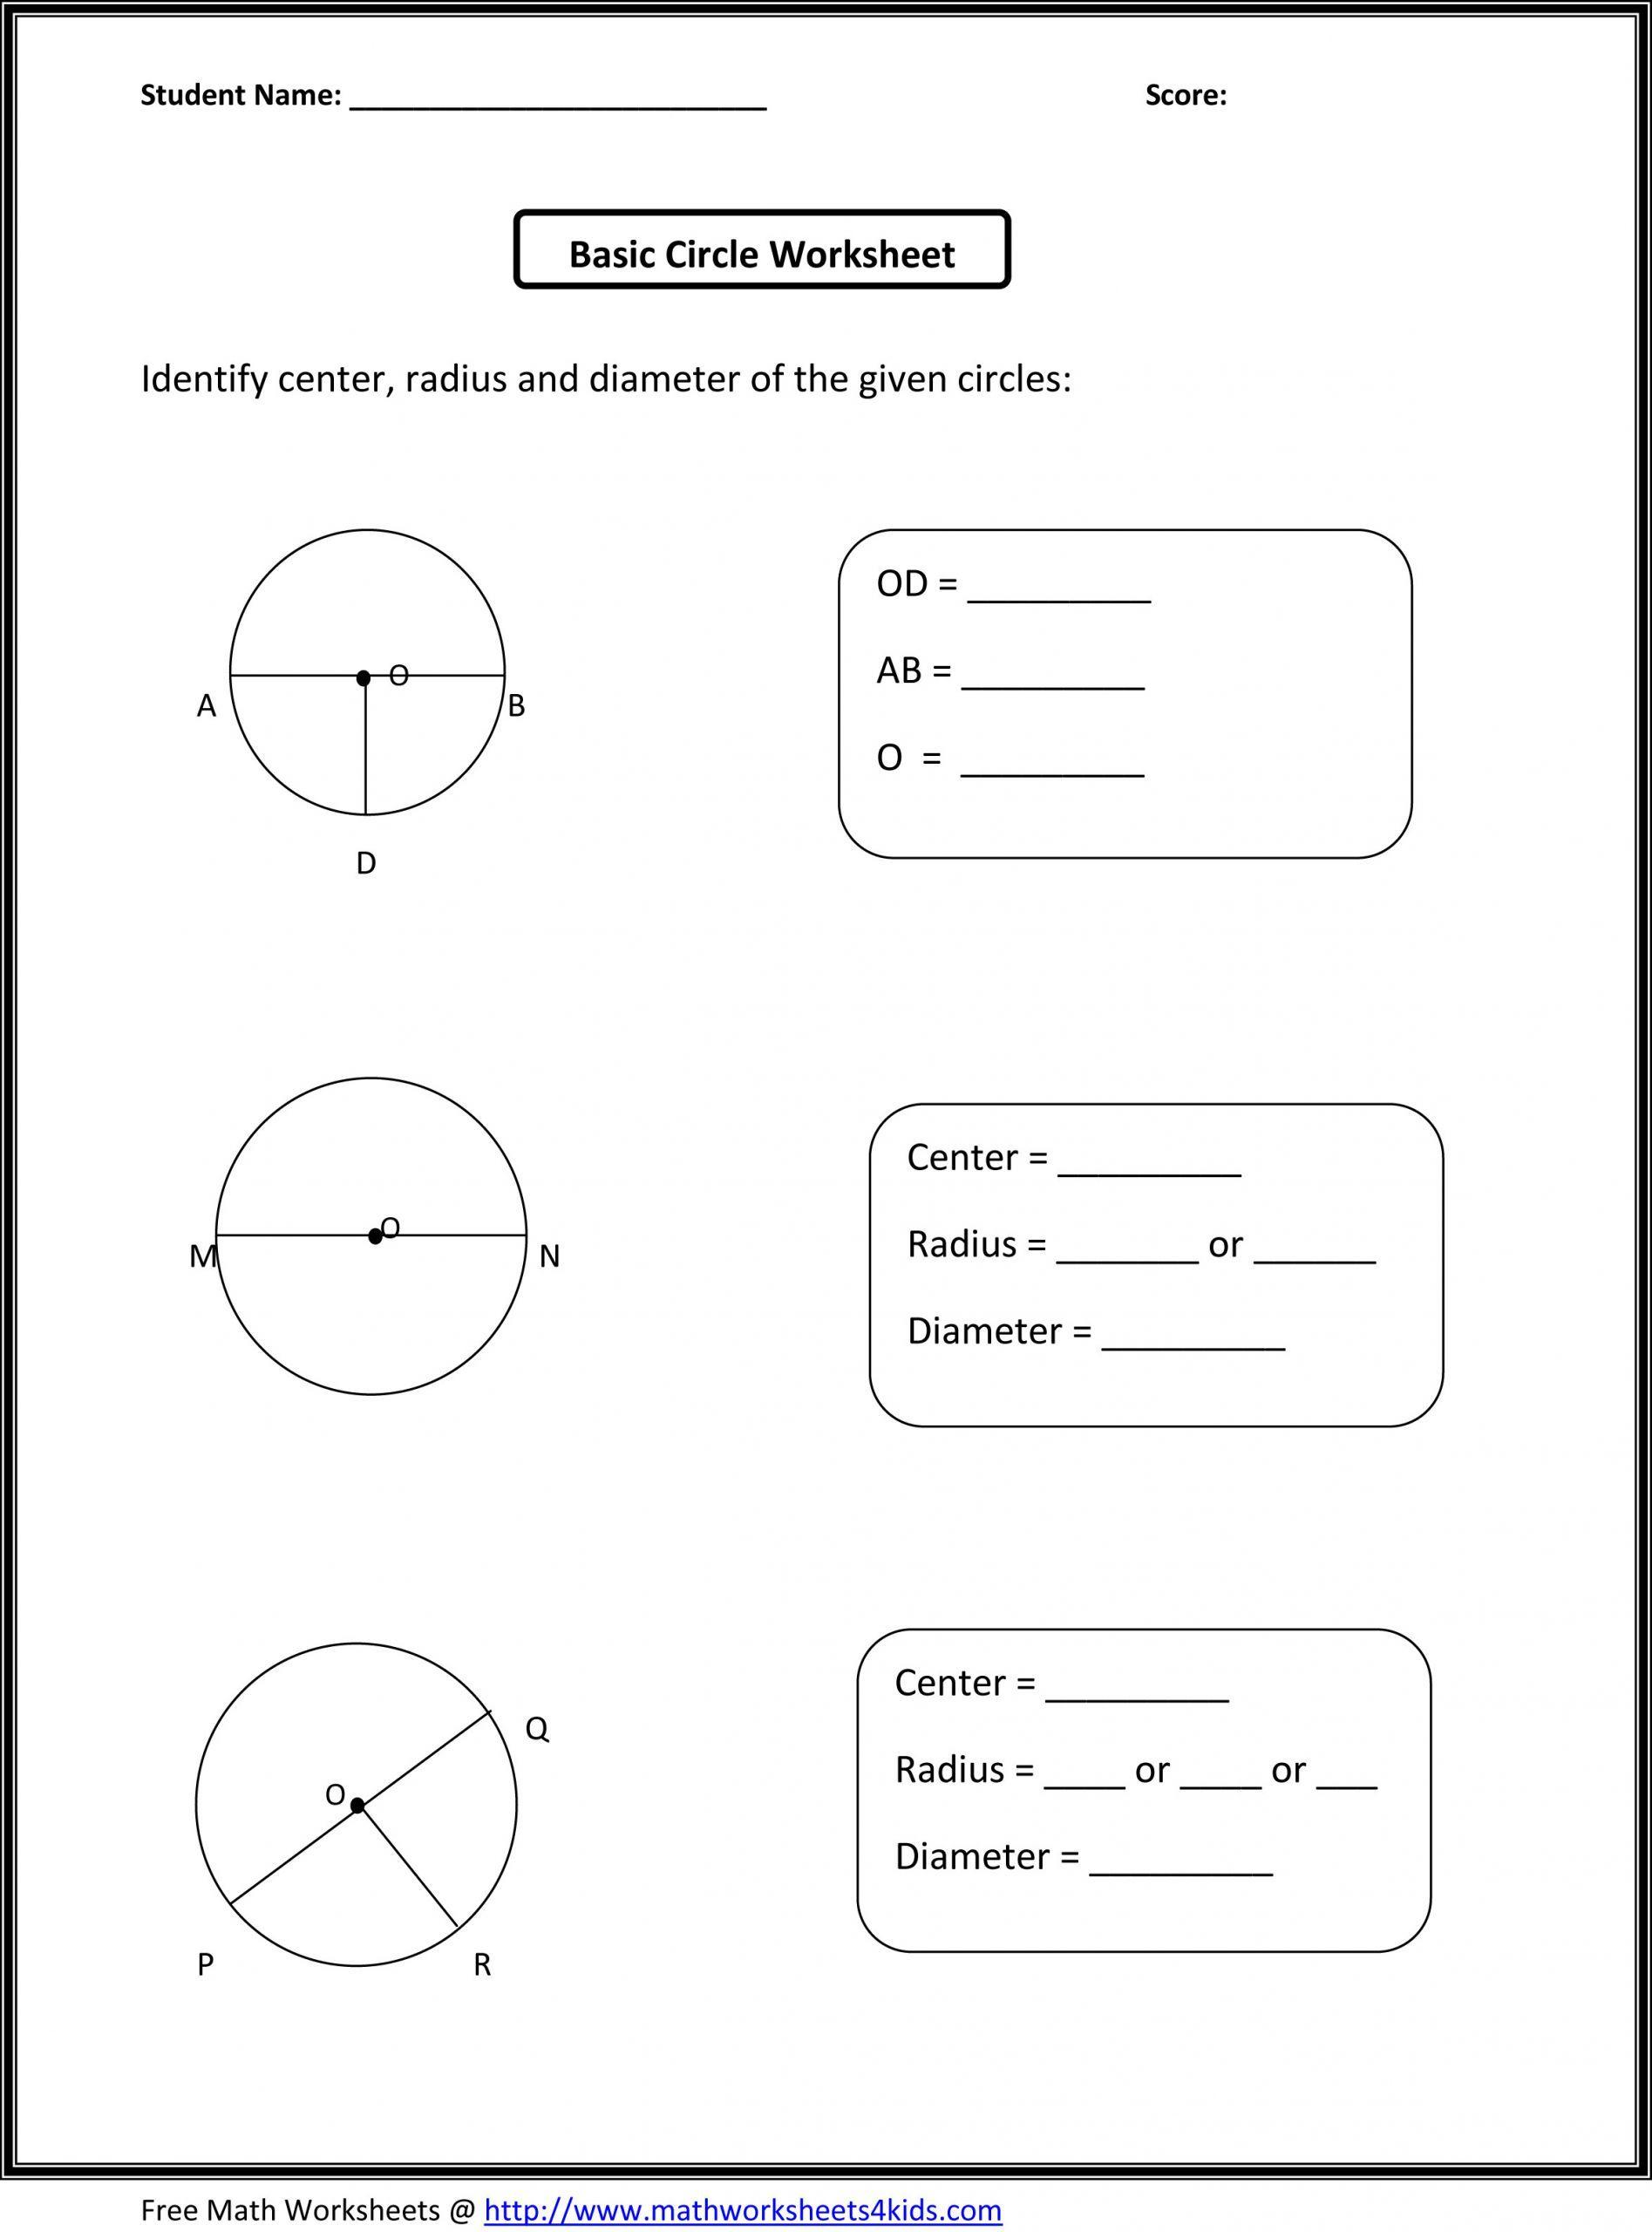 7 Printable Math Worksheets Seventh Grade In 2020 Printable Math Worksheets Free Math Worksheets Math Coloring Worksheets